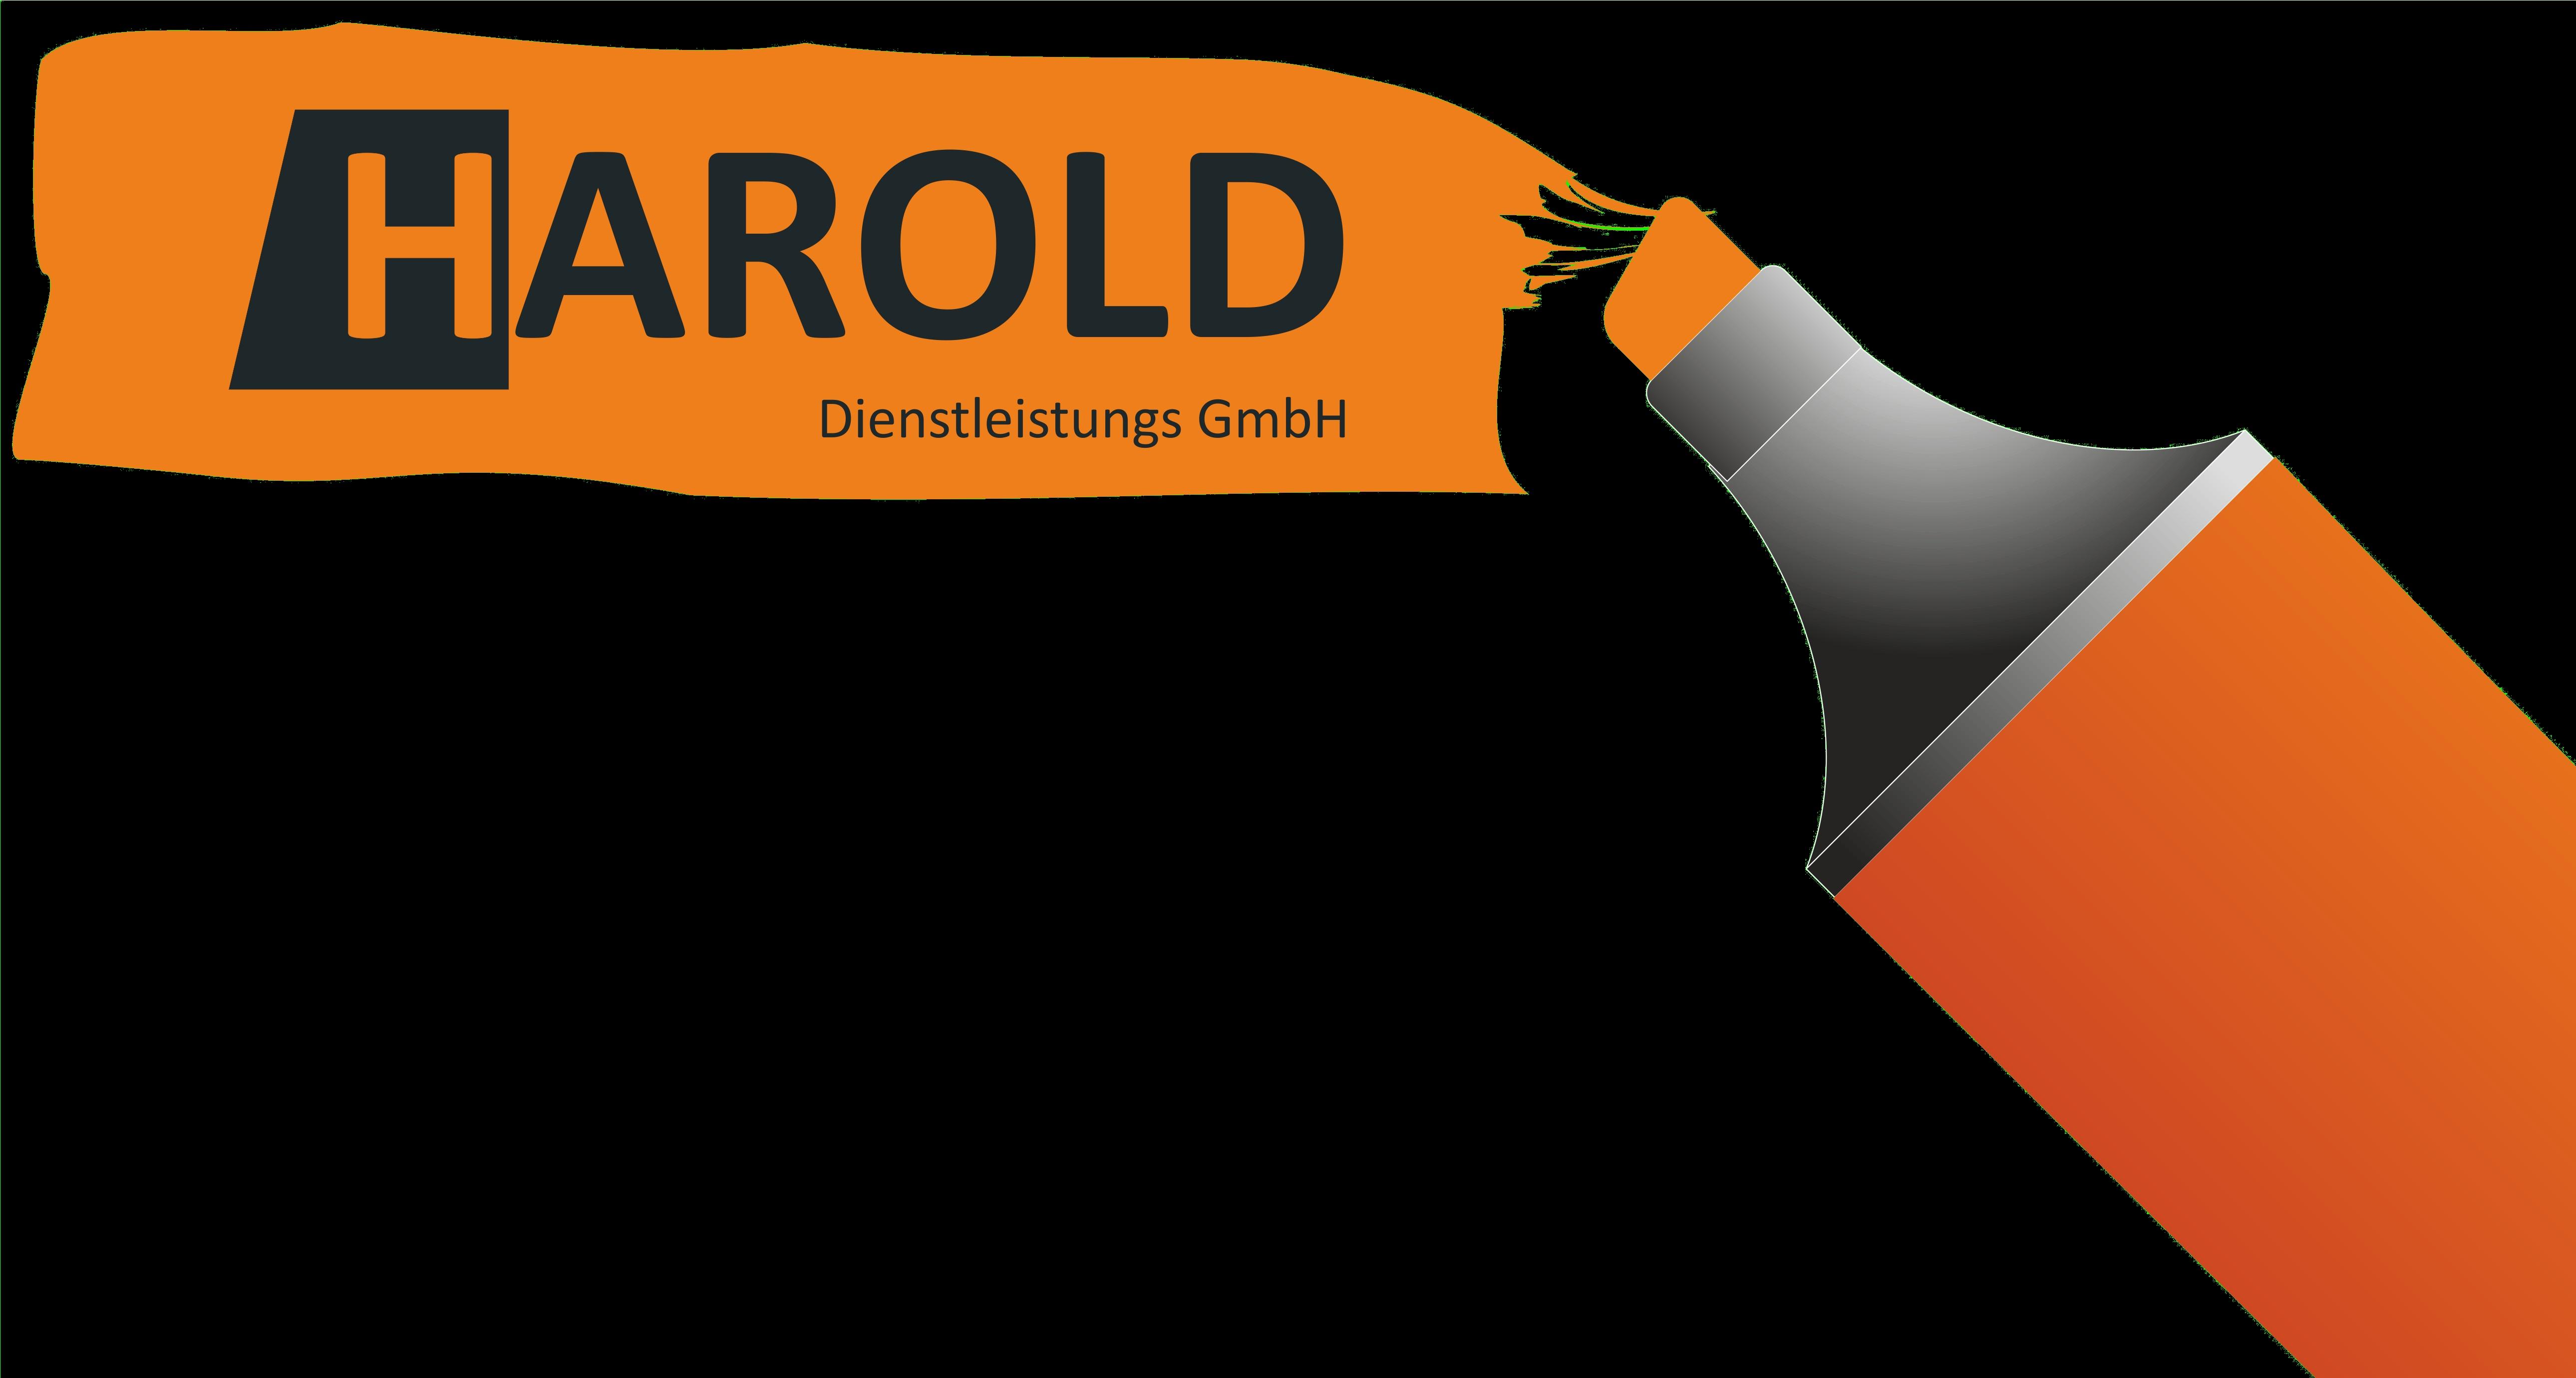 Harold Online Shop – Bedrucktes Klebeband/ Absperrband